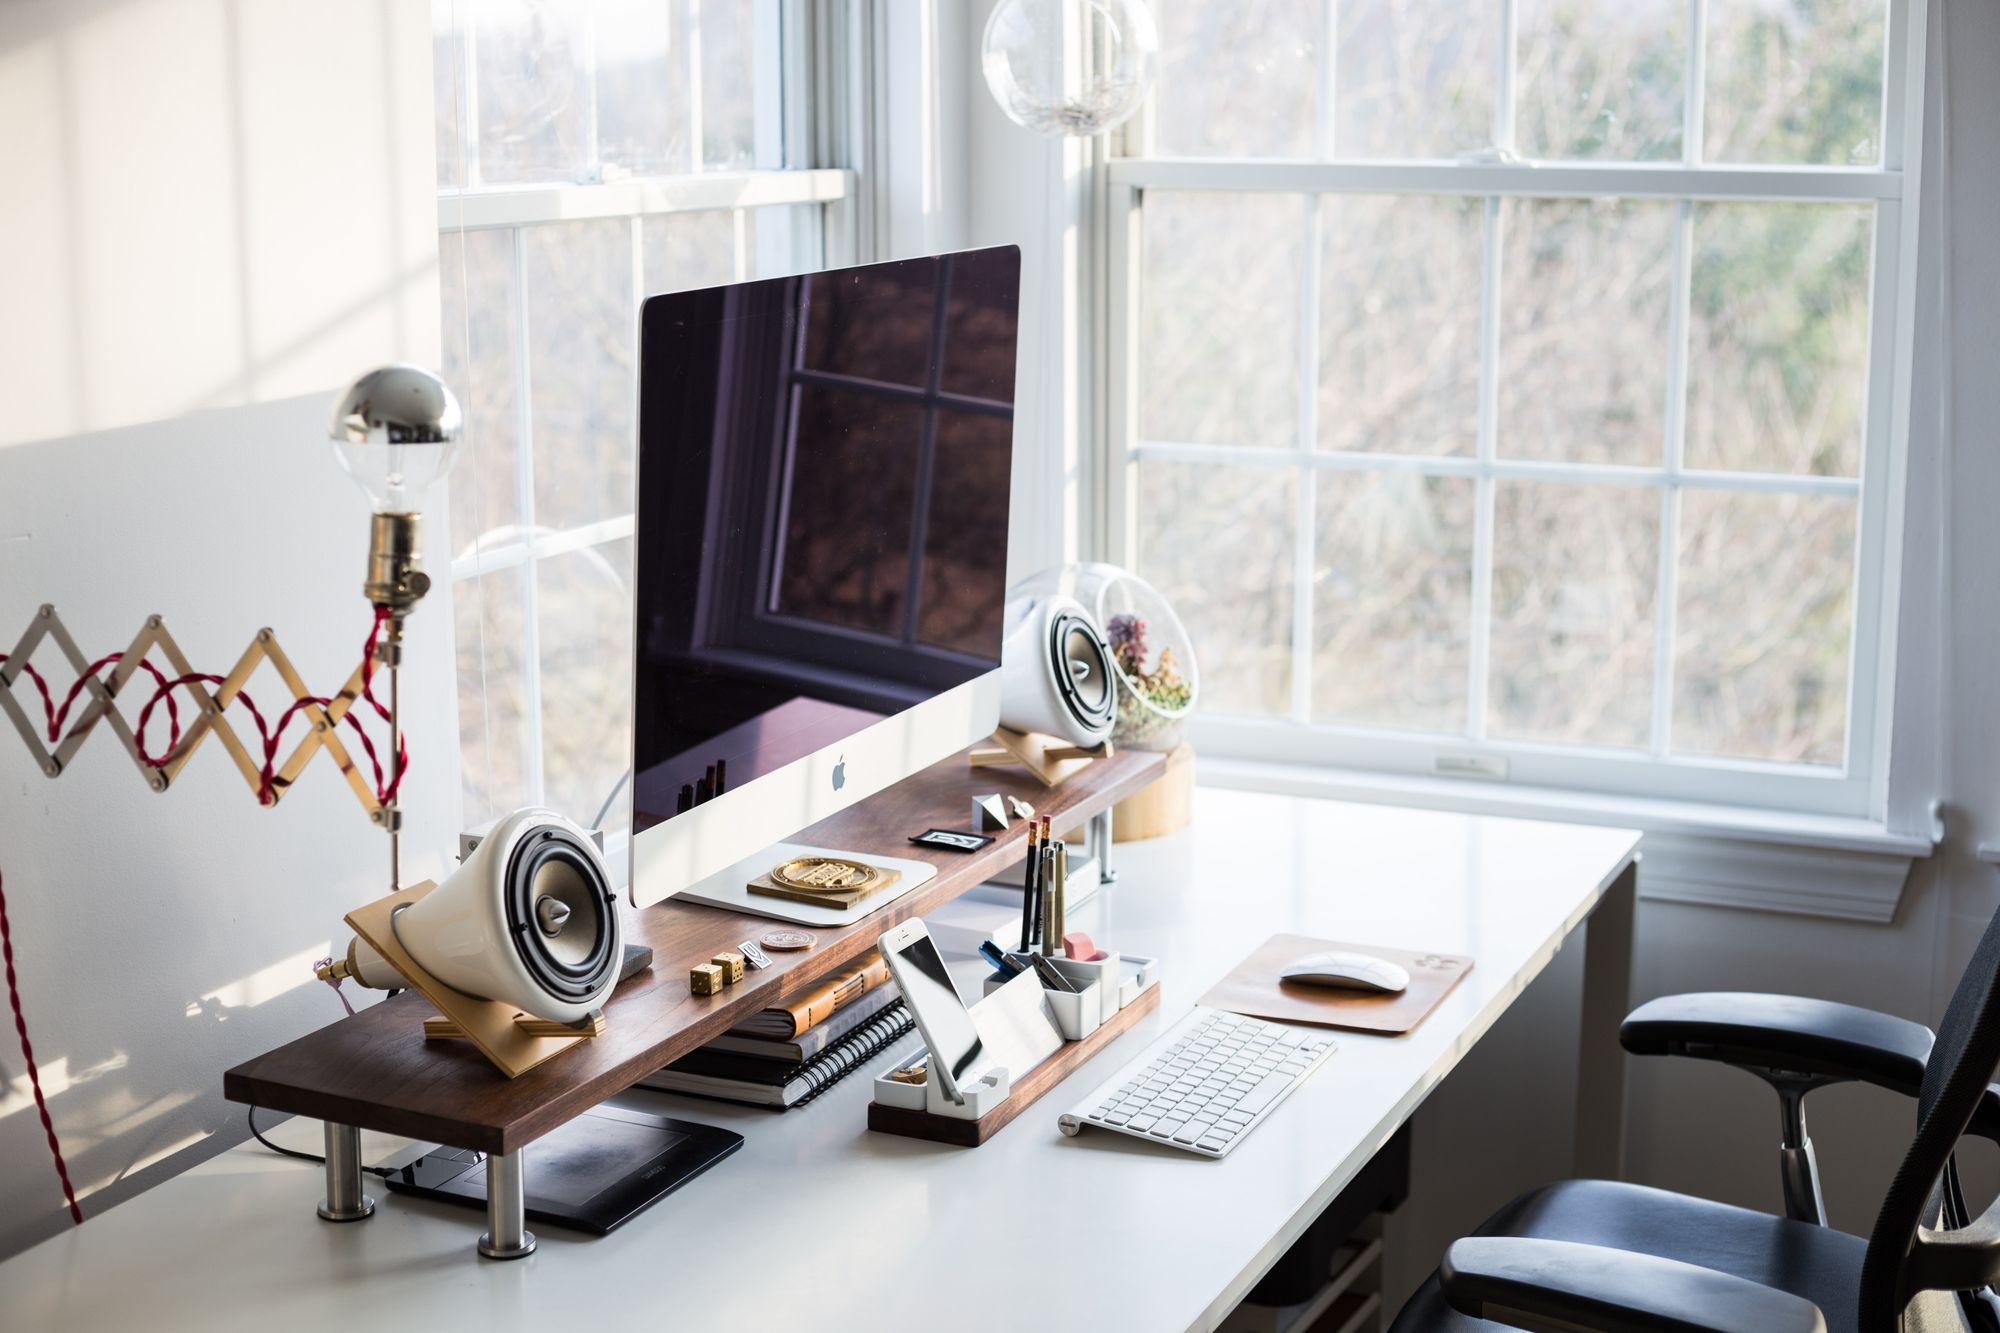 An ergonomic home workstation